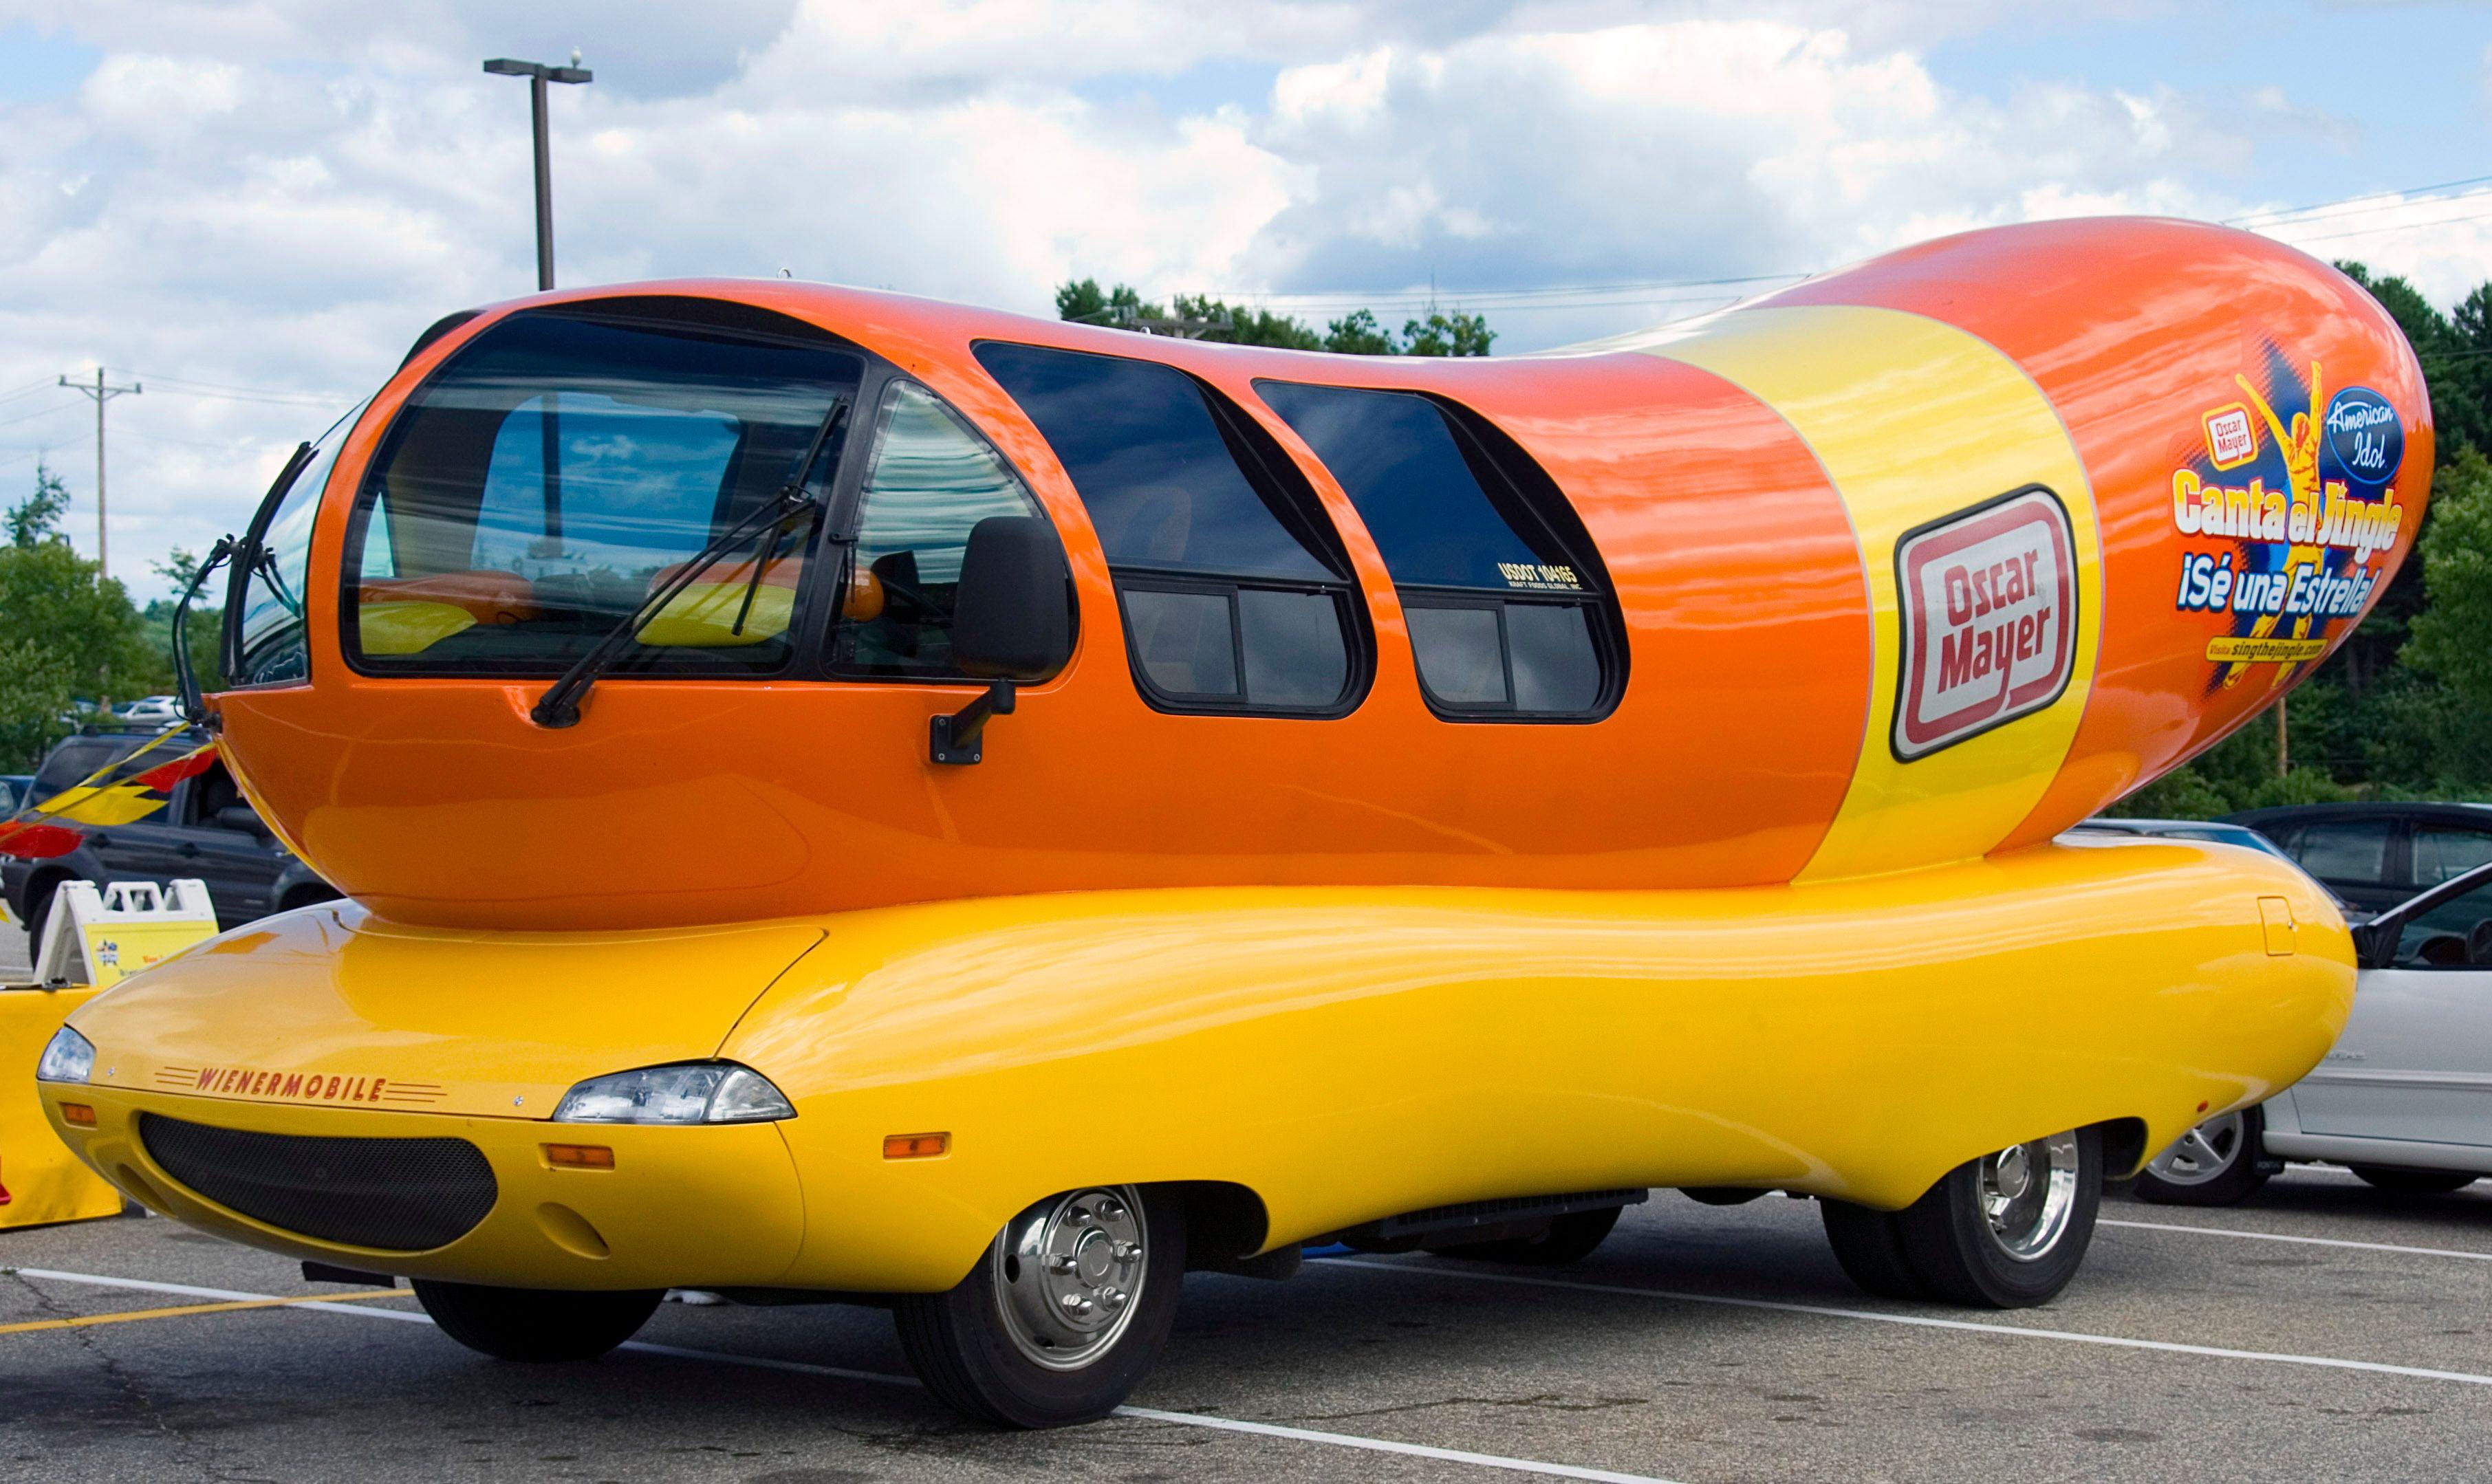 The Wienermobile